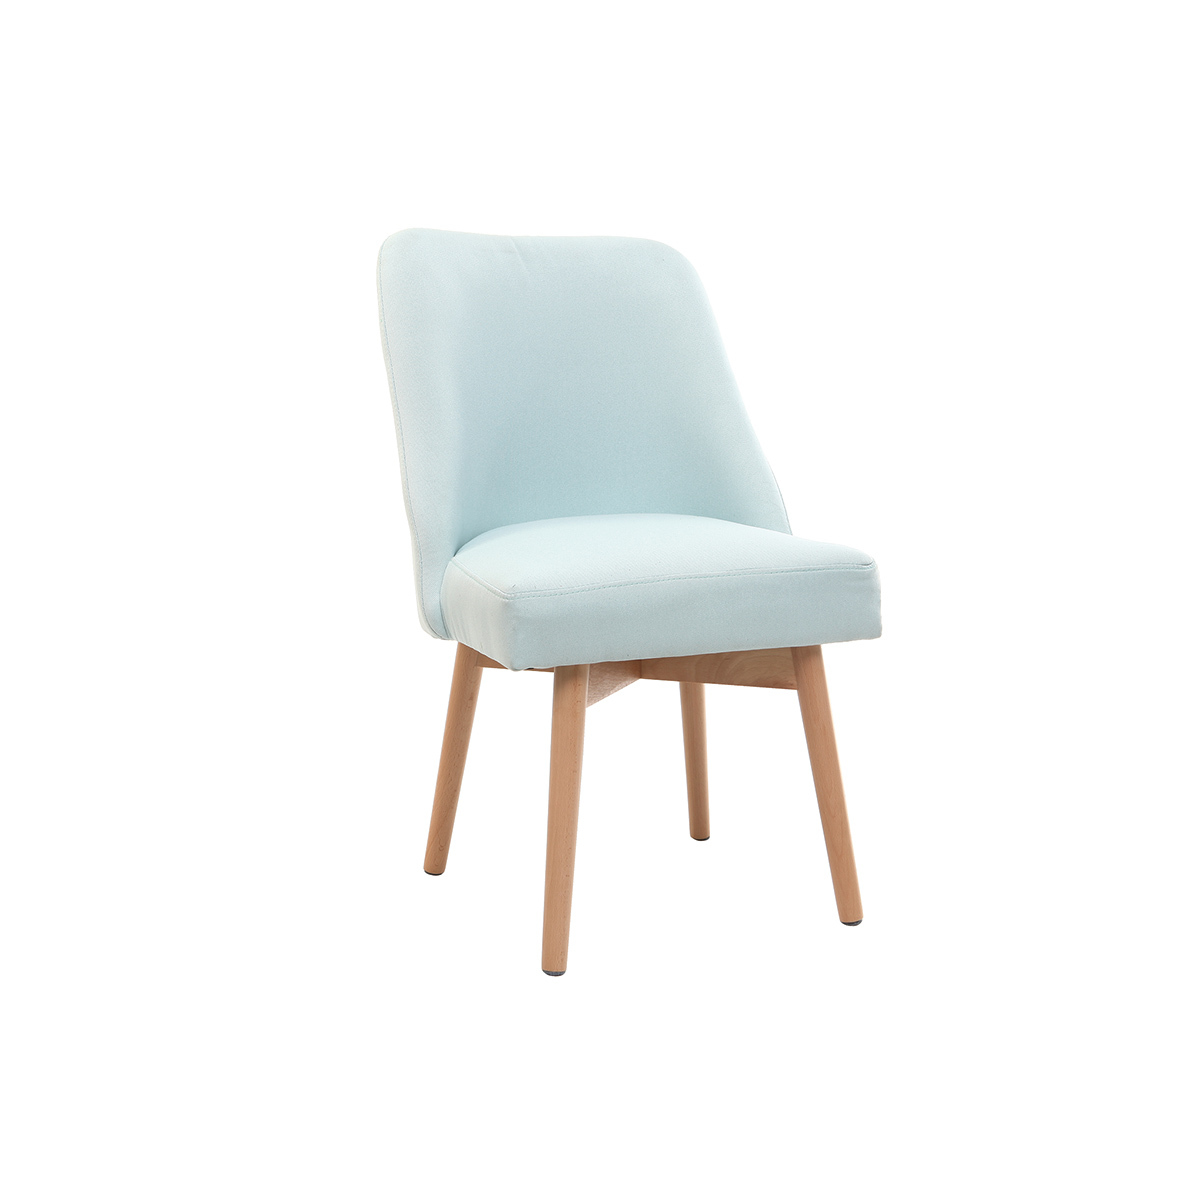 chaise scandinave tissu menthe - Lot 6 Chaises Scandinaves2126